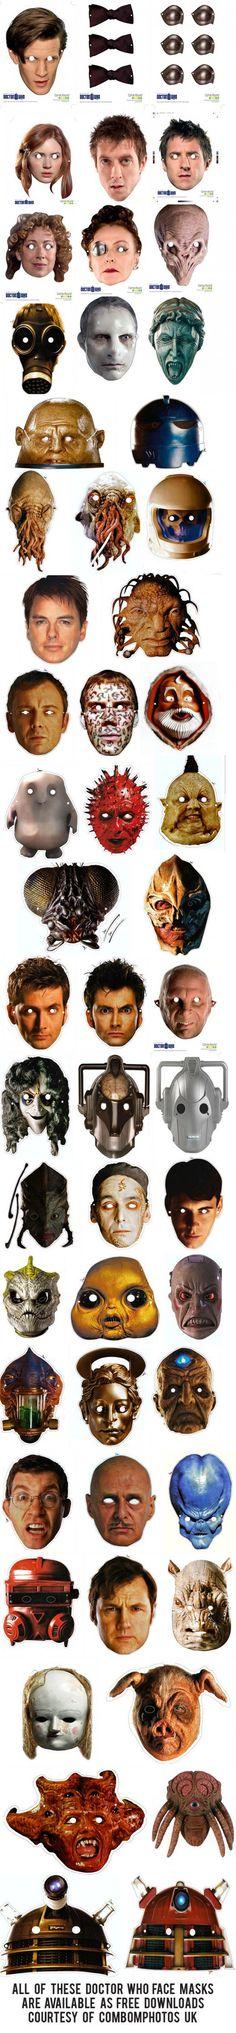 Whovian printables face masks